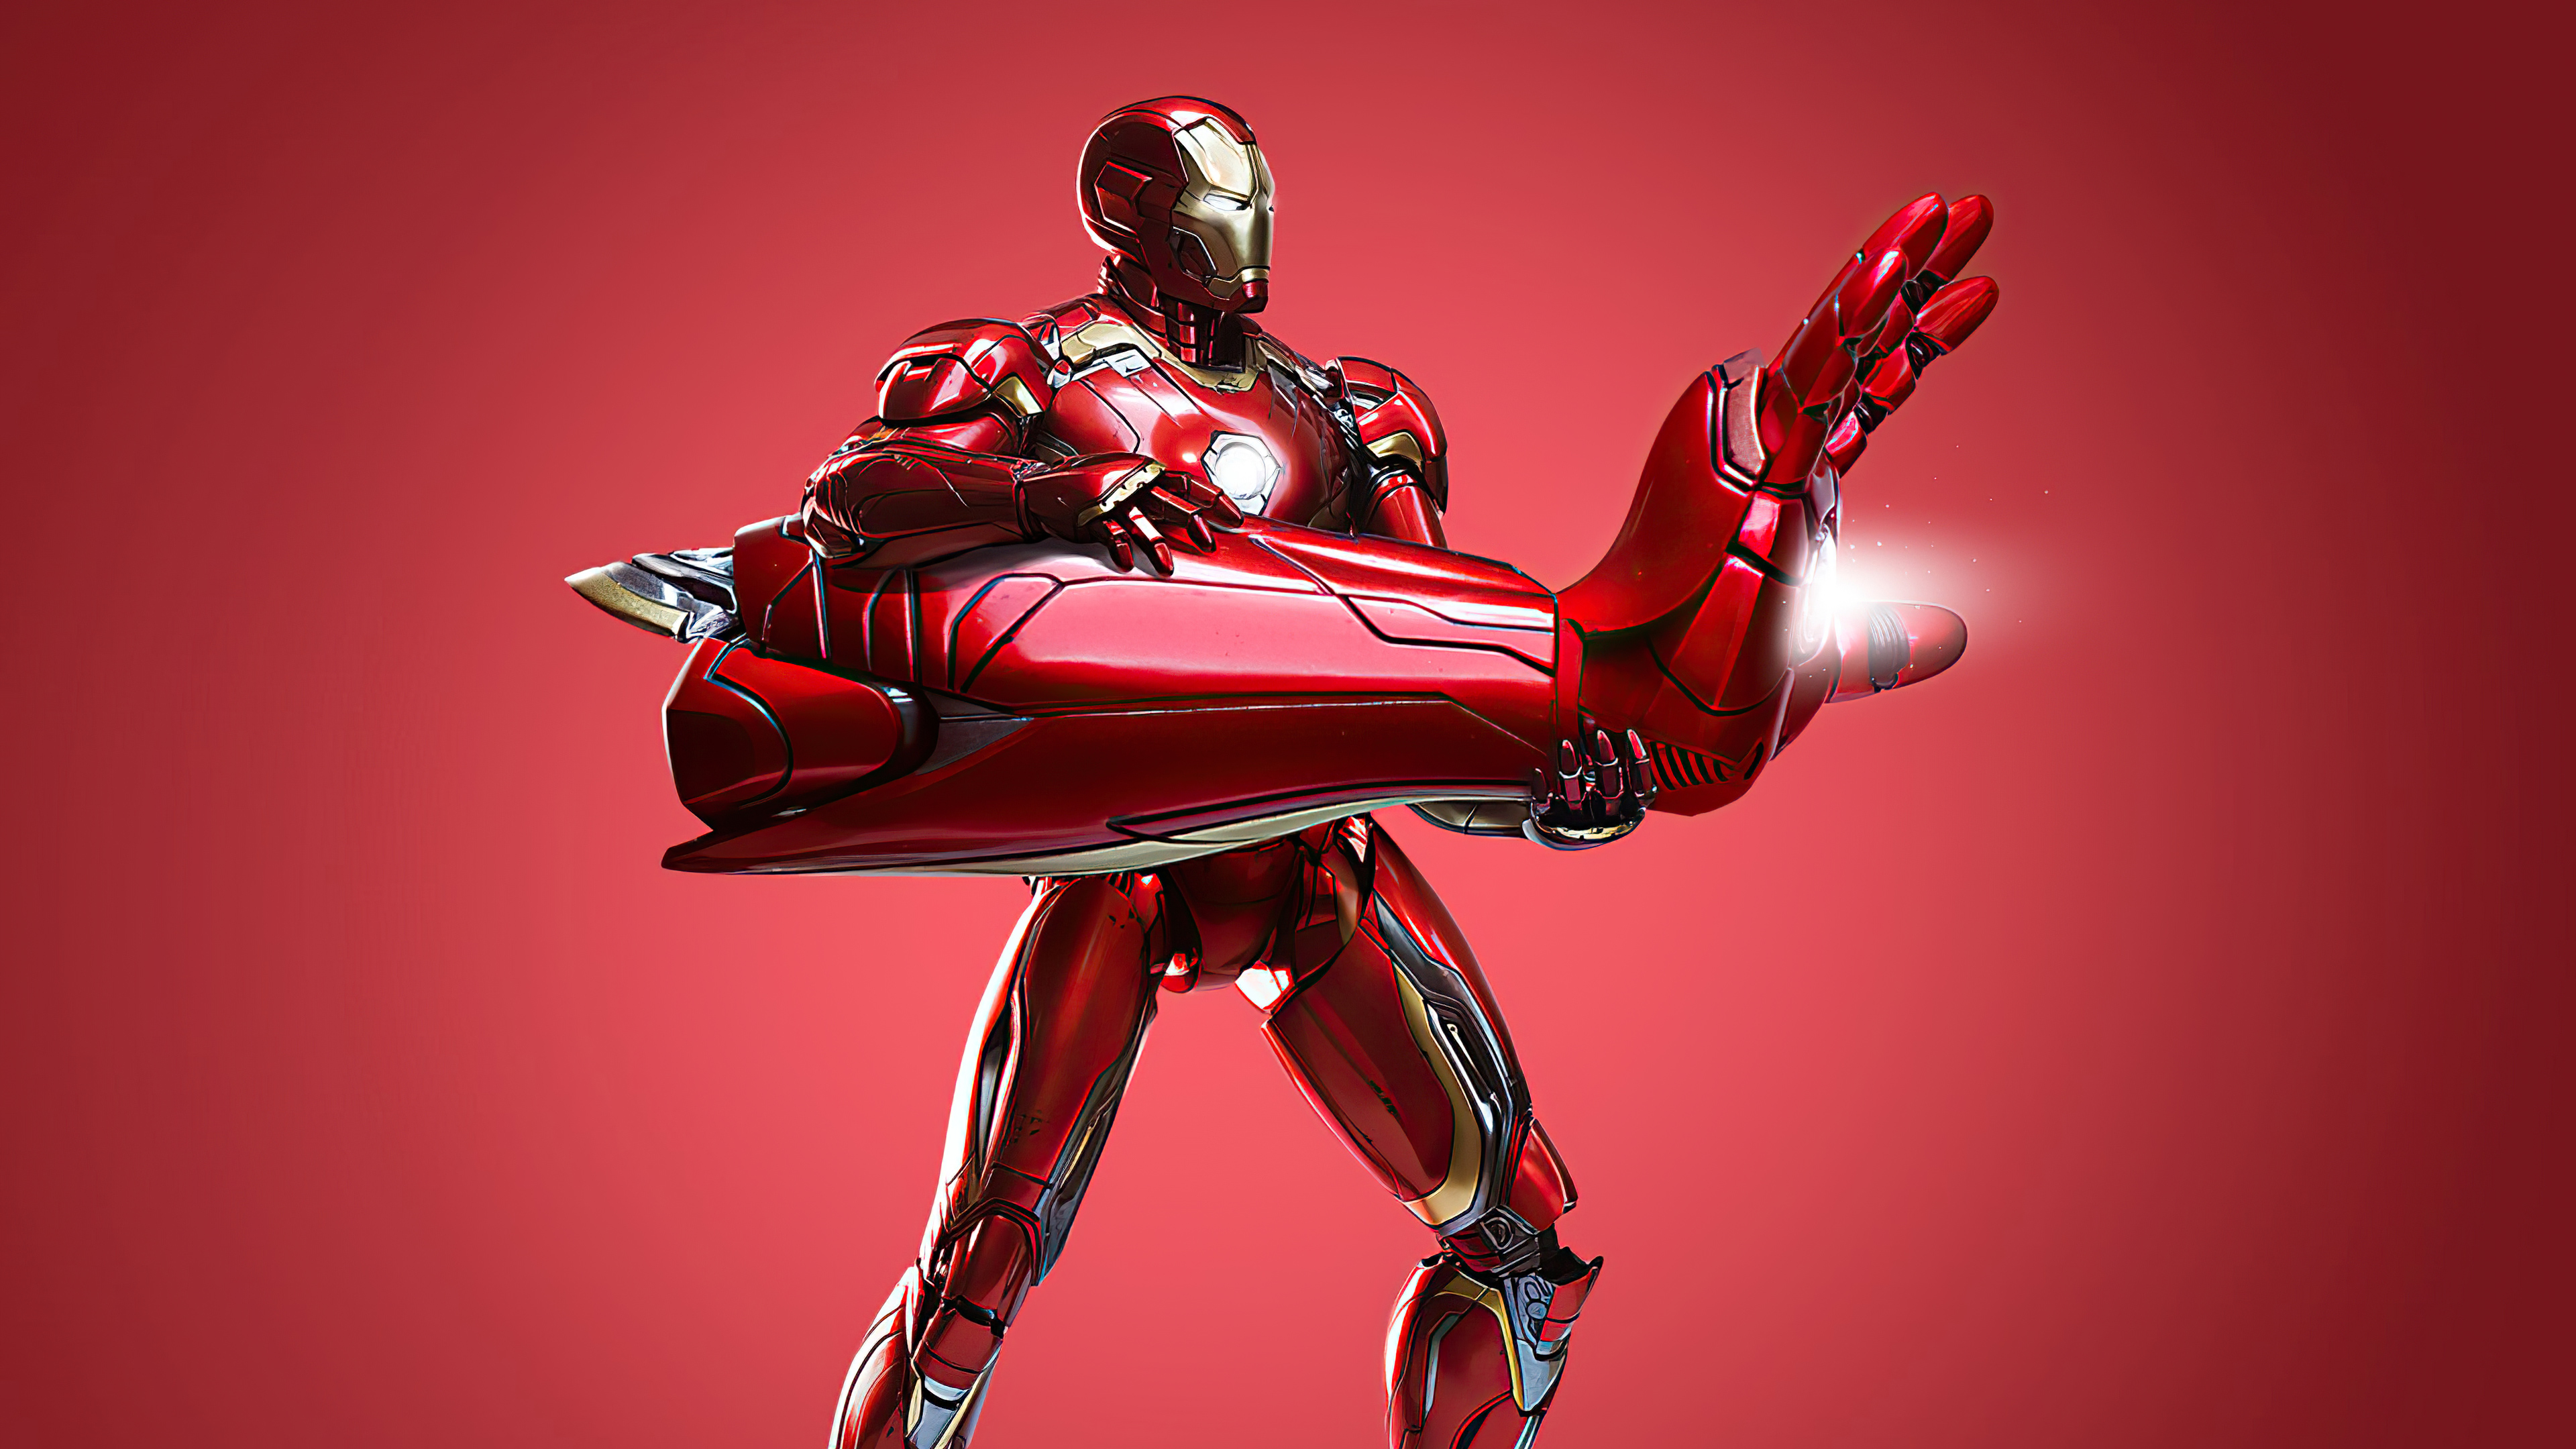 Wallpaper Iron Man 2021